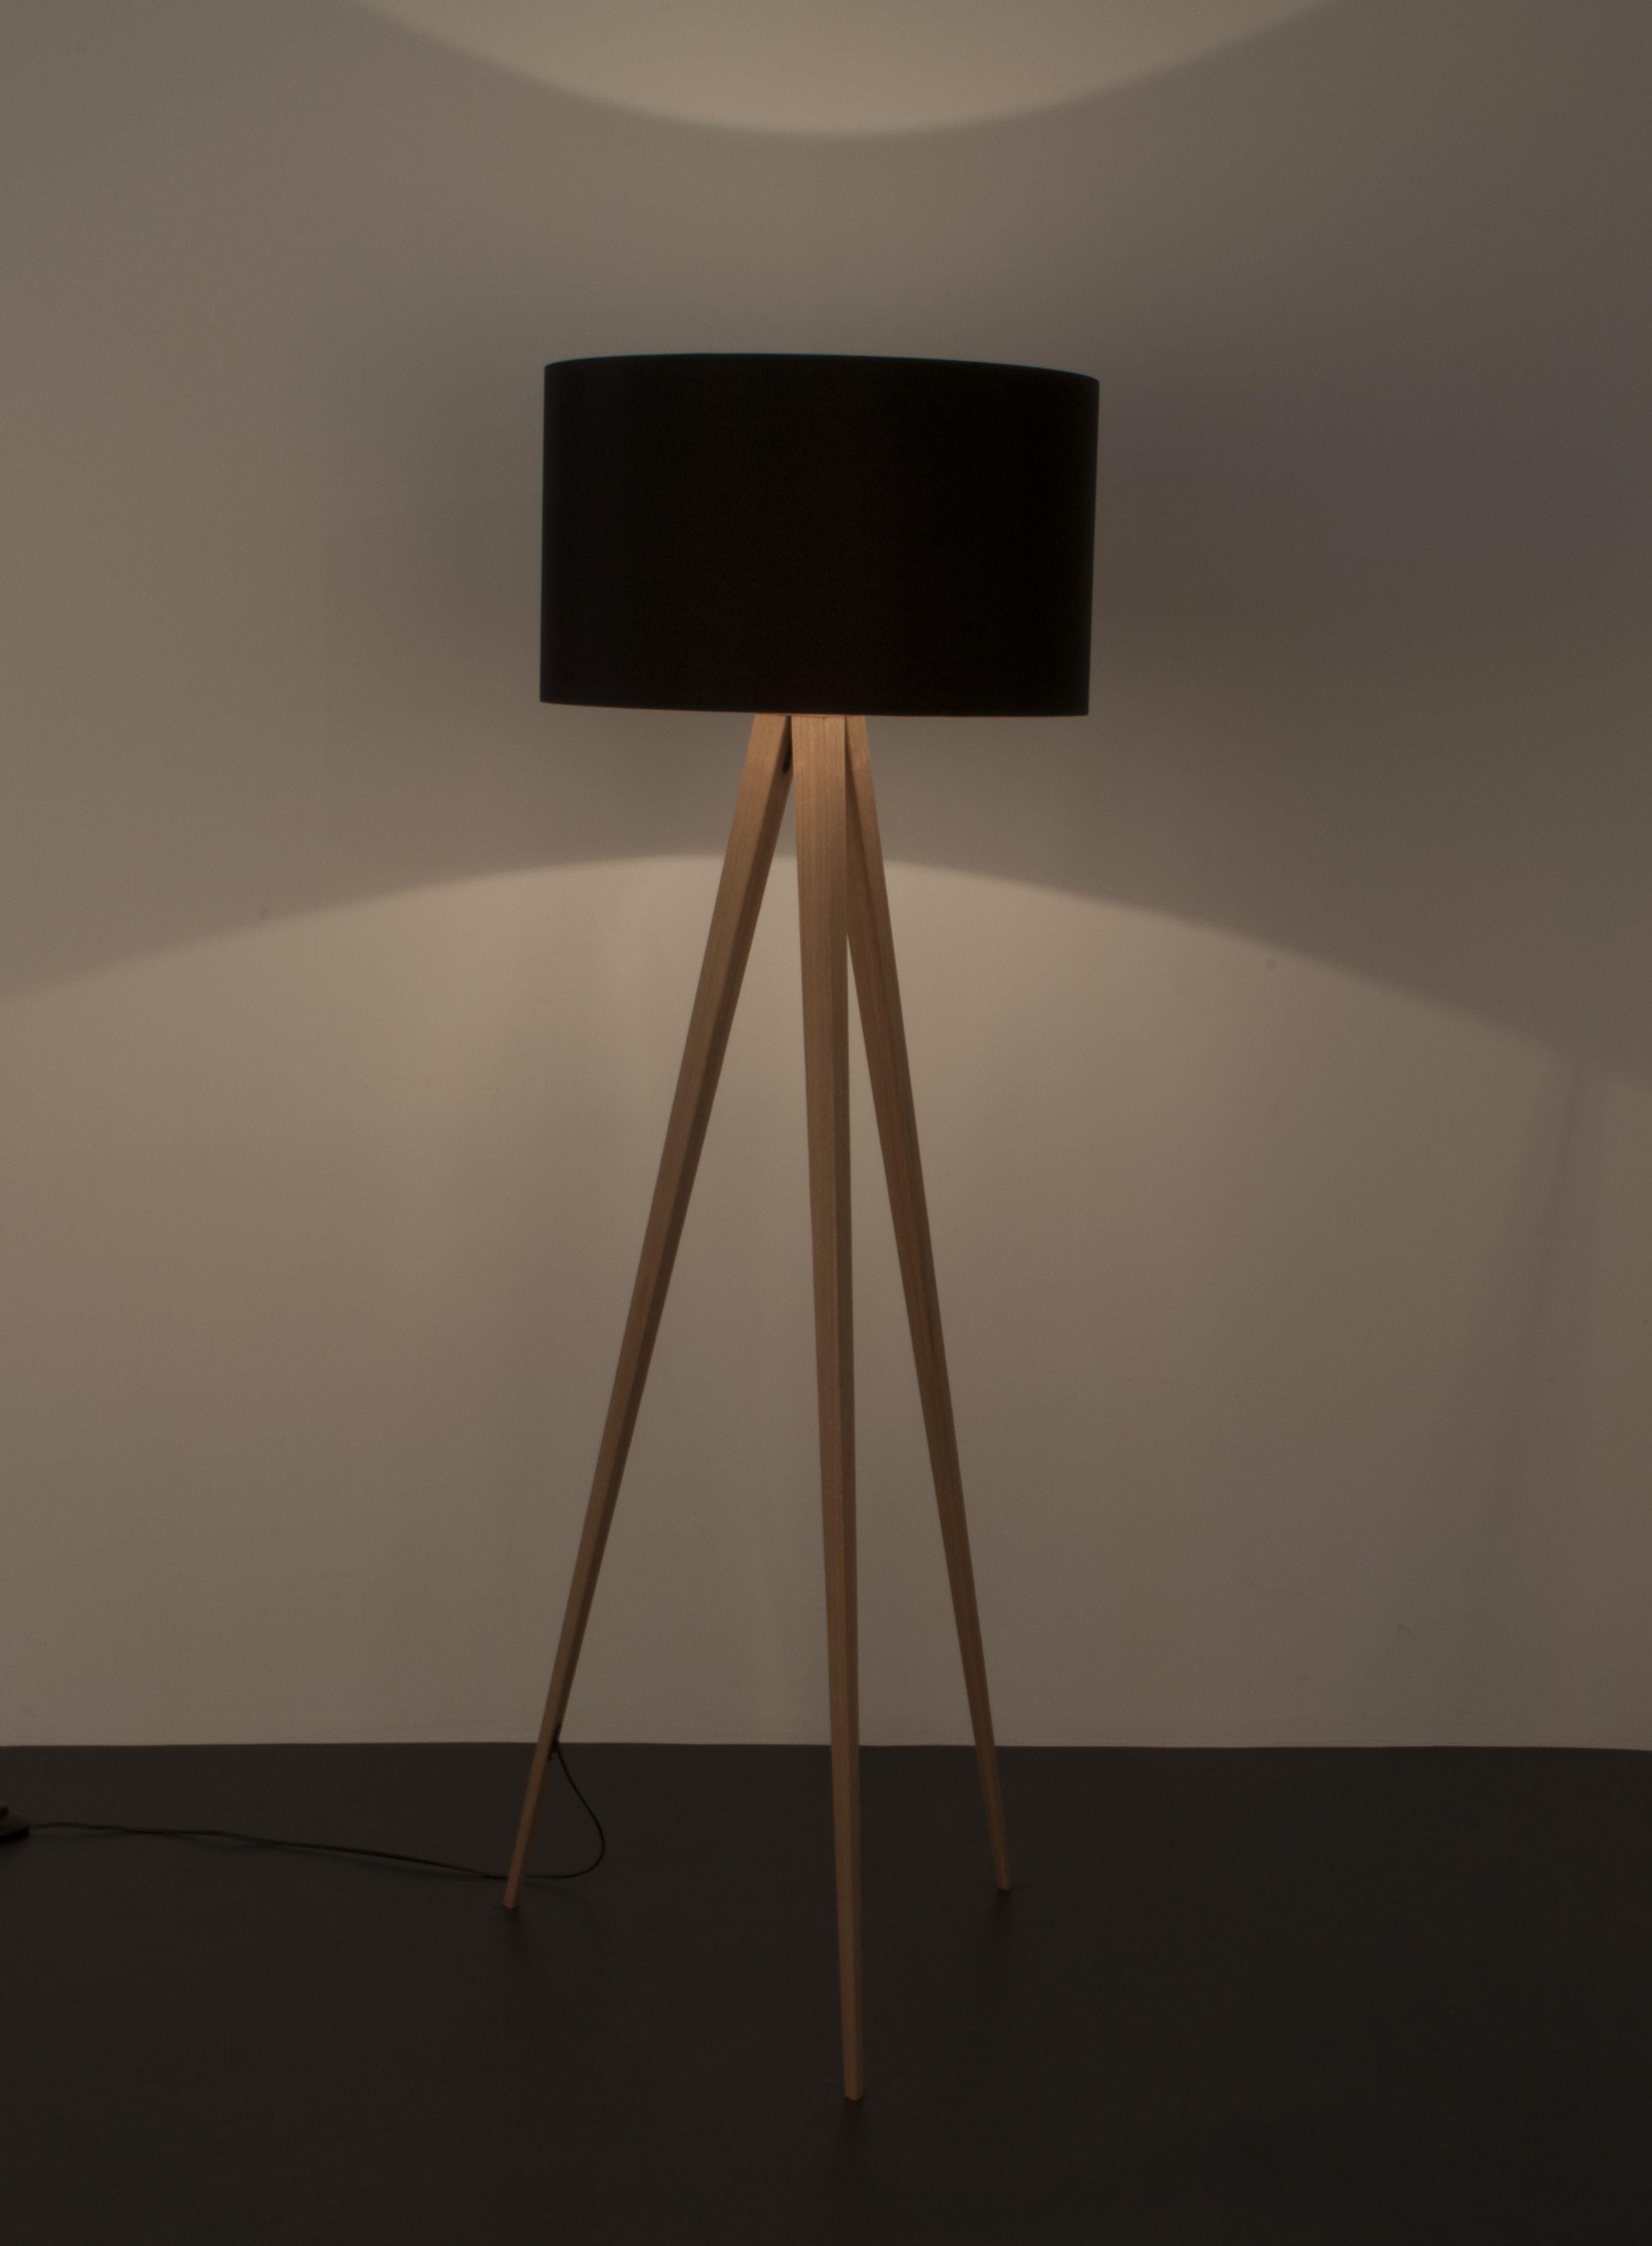 Zuiver - Tripod Wood Gulvlampe - Sort - Sort gulvlampe i træfiner